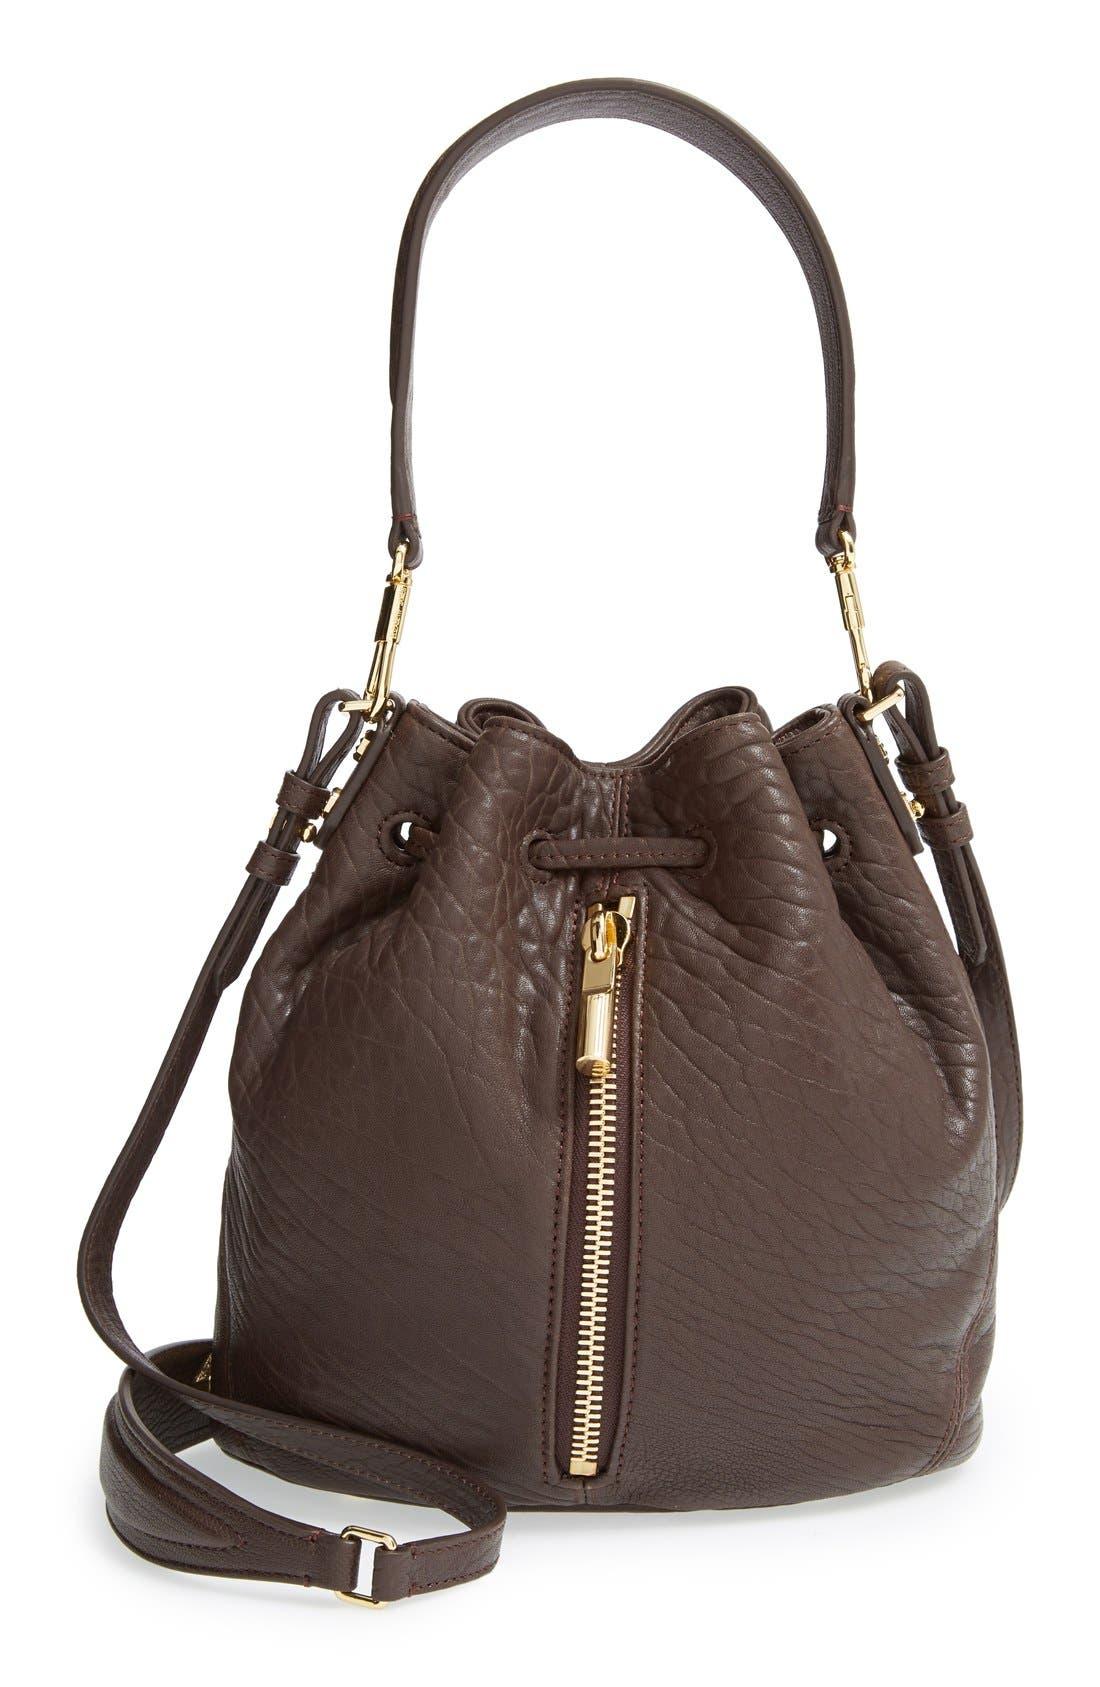 Alternate Image 1 Selected - Elizabeth and James 'Mini Cynnie' Bucket Bag